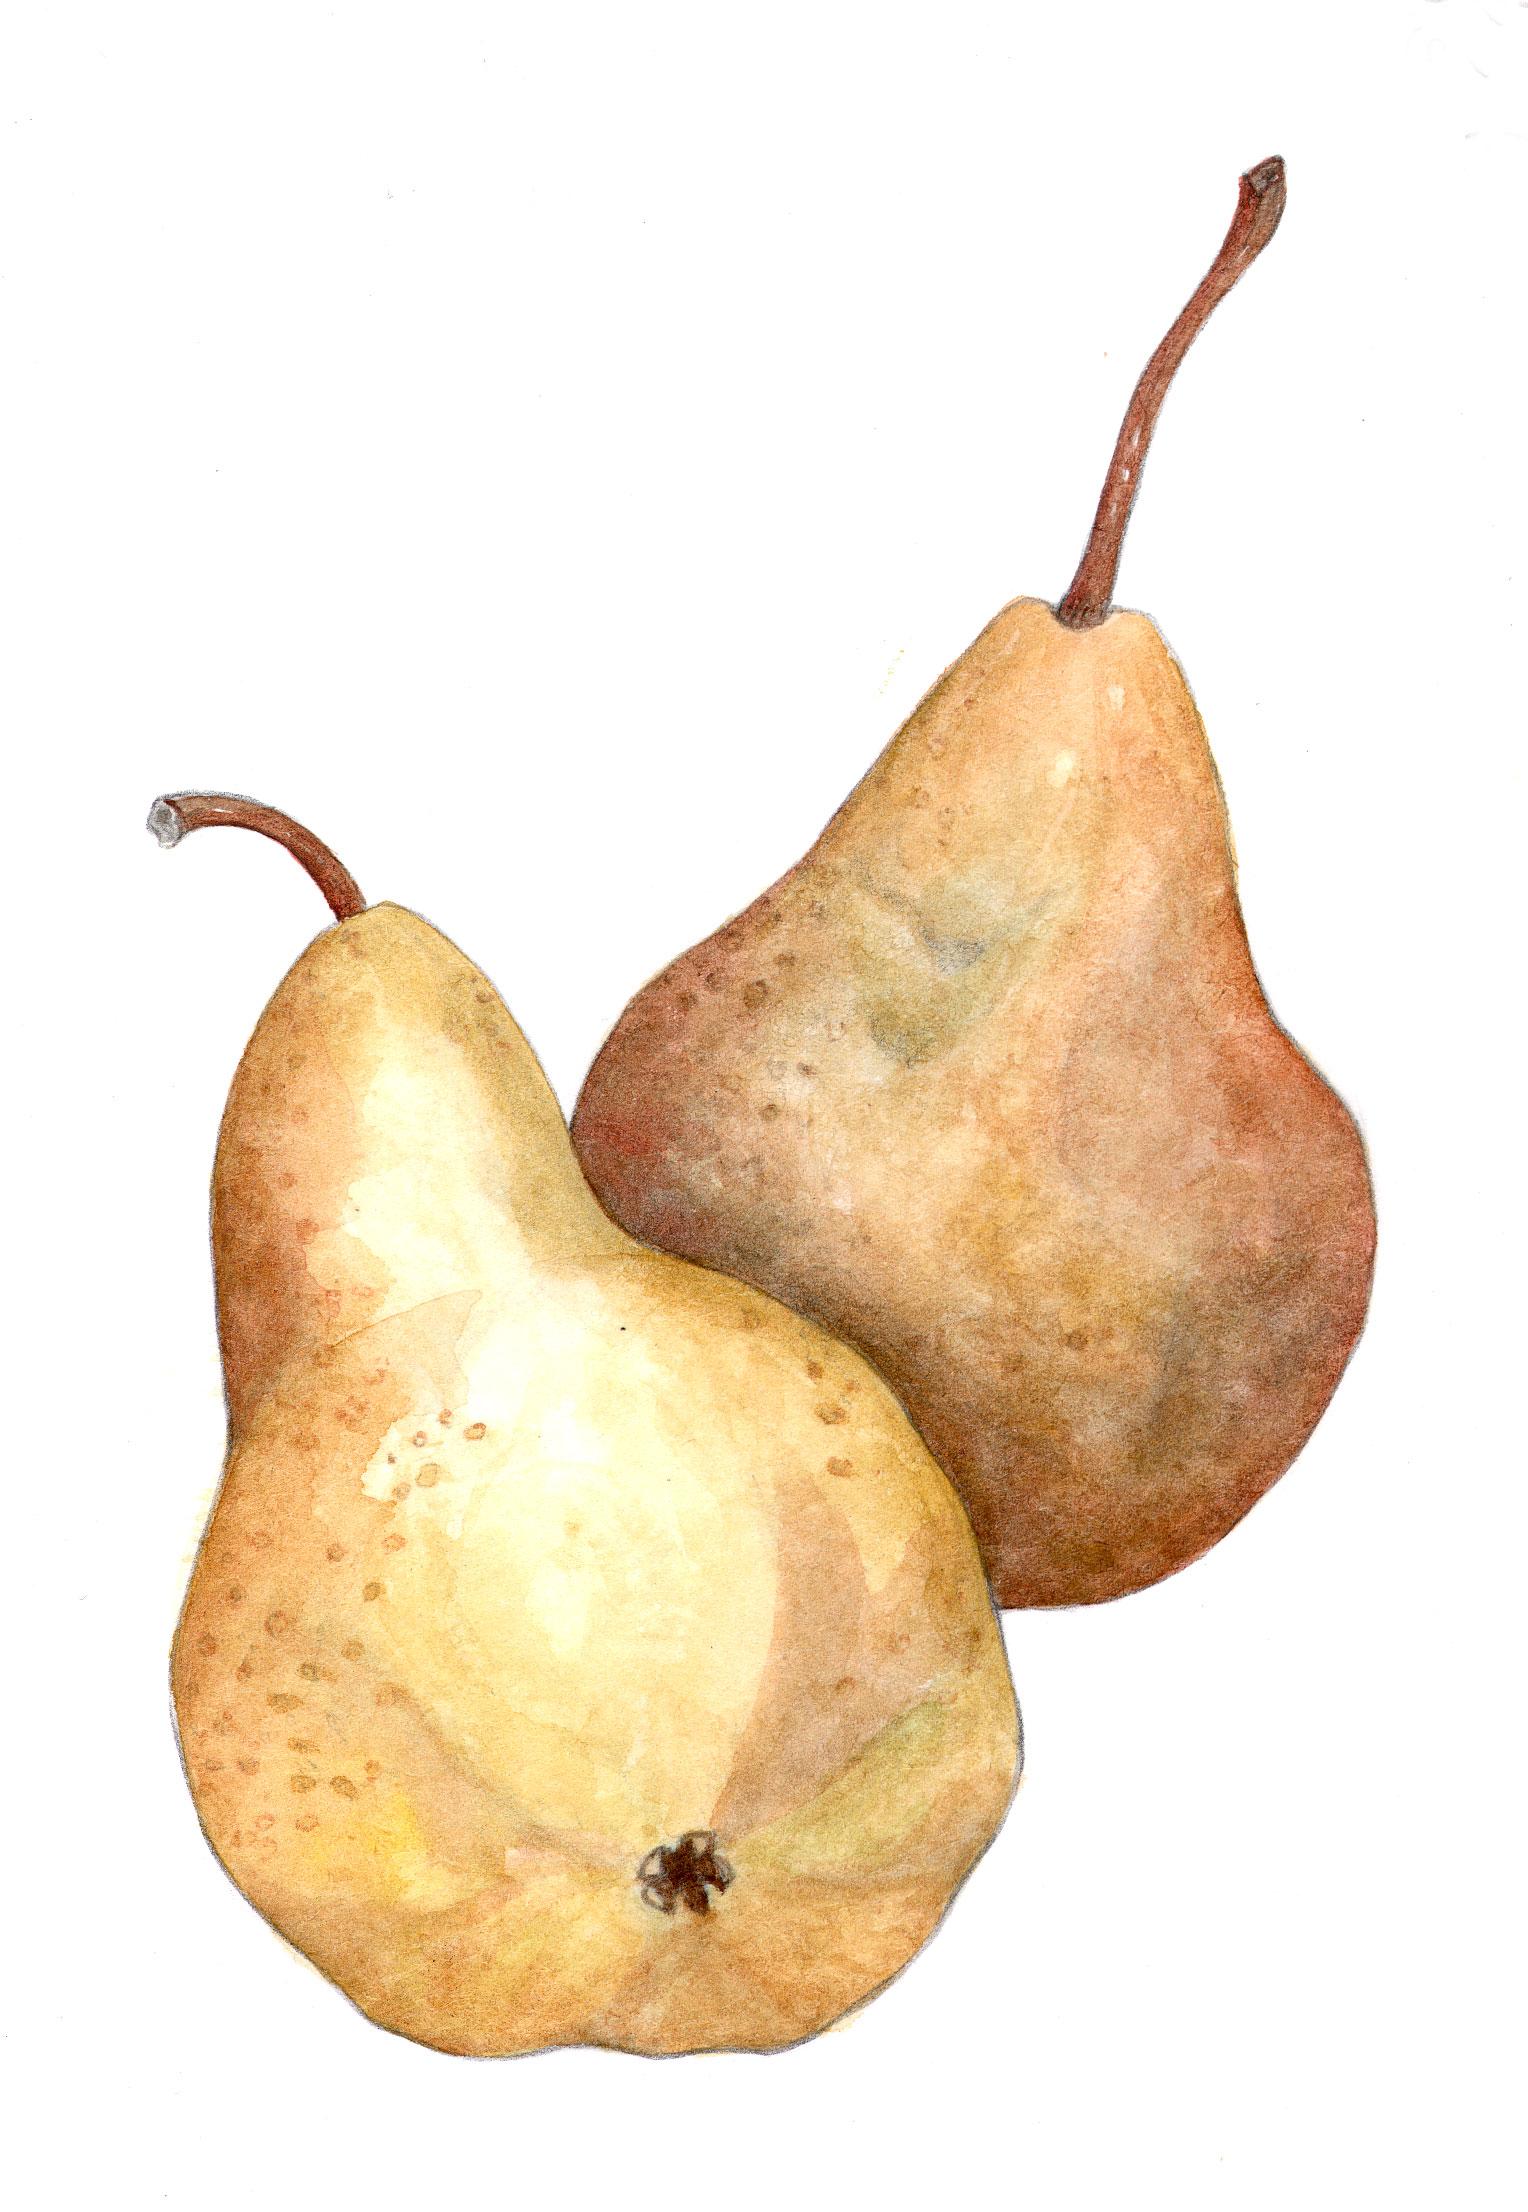 Bosc Pears (Pyrus comminus)